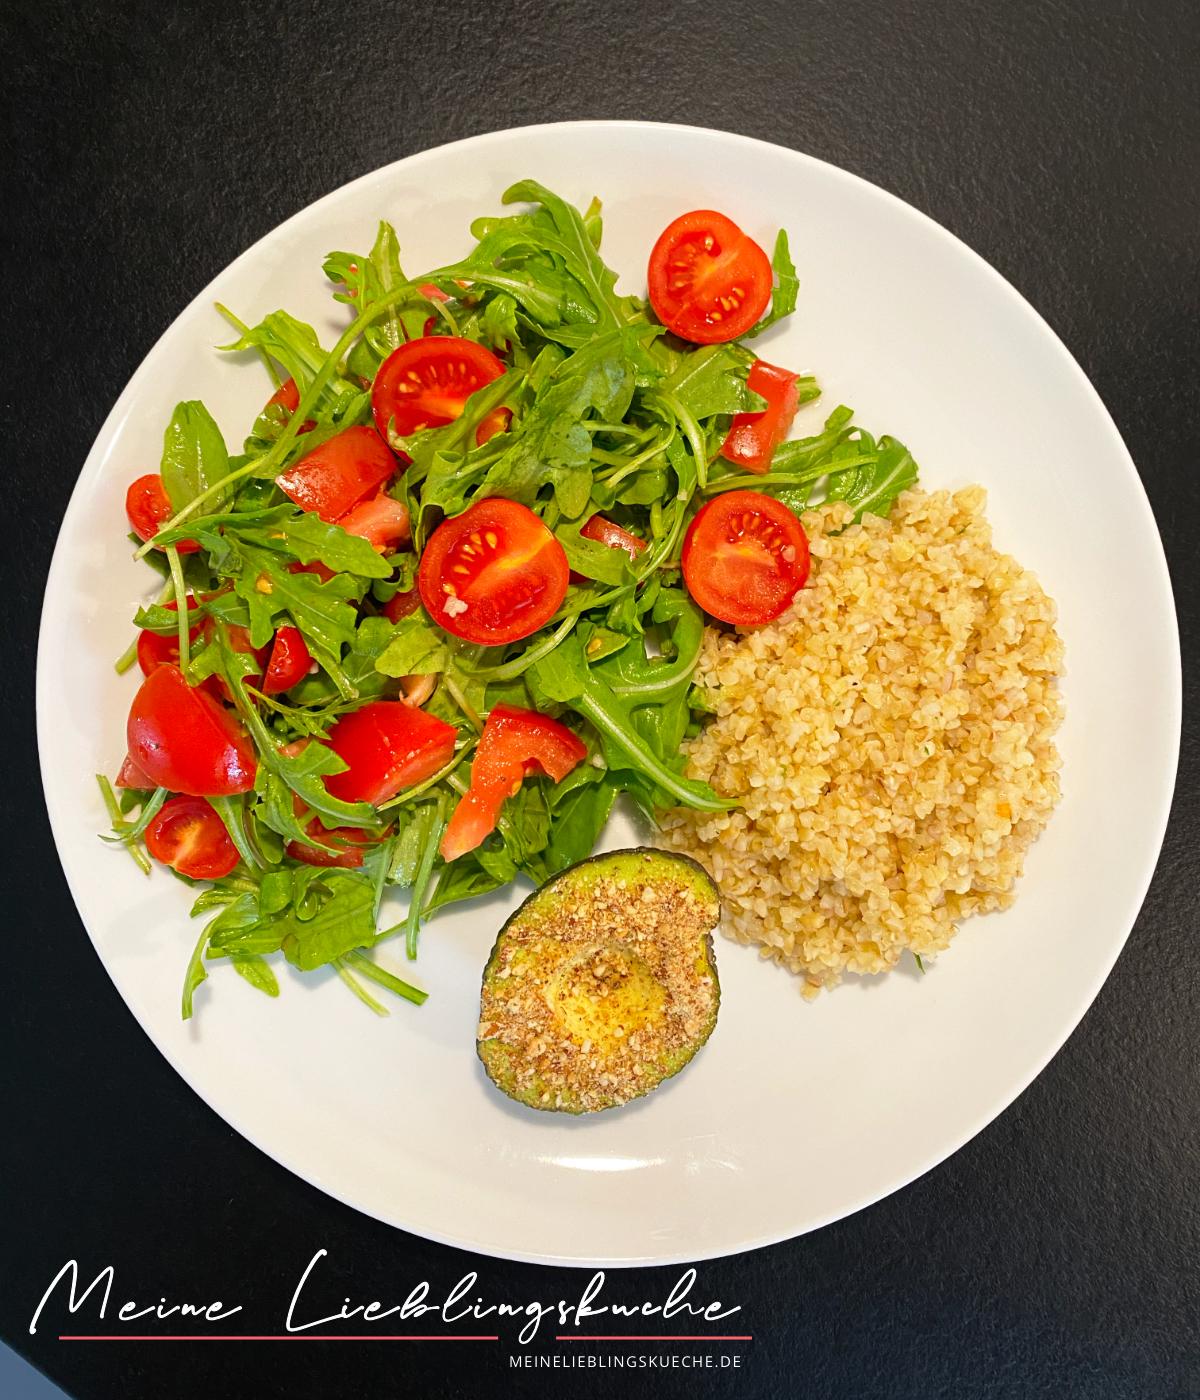 Bulgur mit Rucola-Tomaten-Salat und Avocado